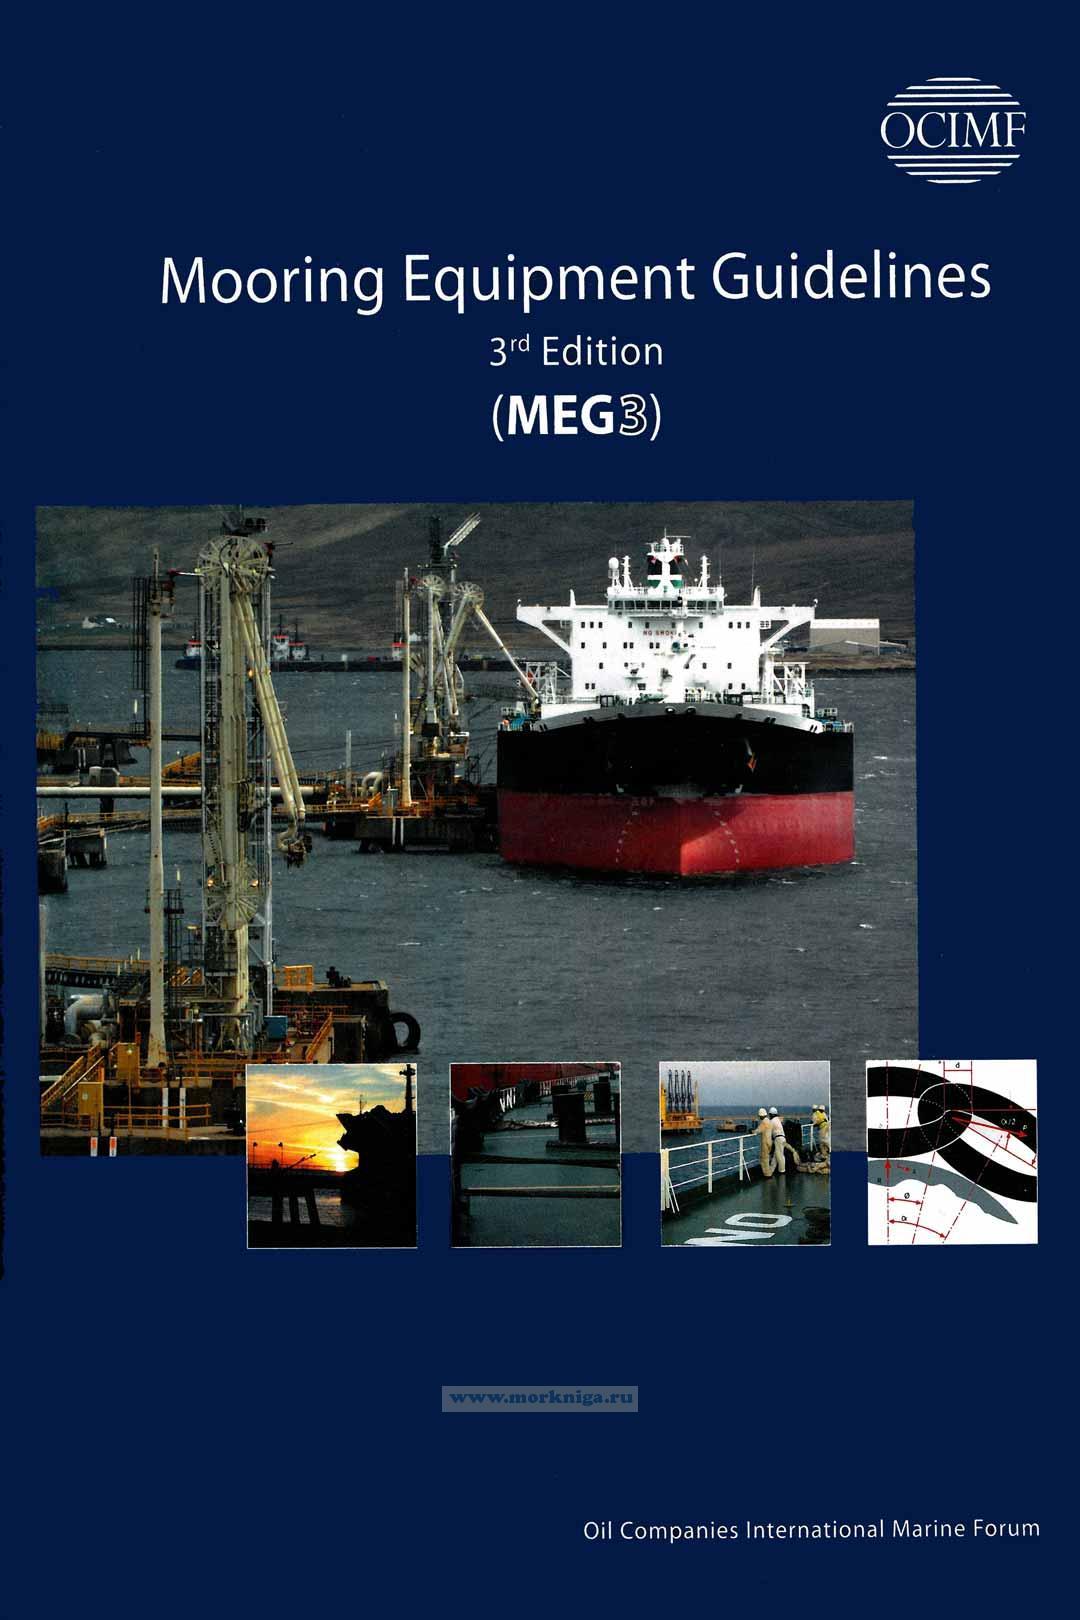 mooring equipment guidelines rh morkniga ru mooring equipment guidelines meg4 publisher mooring equipment guidelines 3rd edition